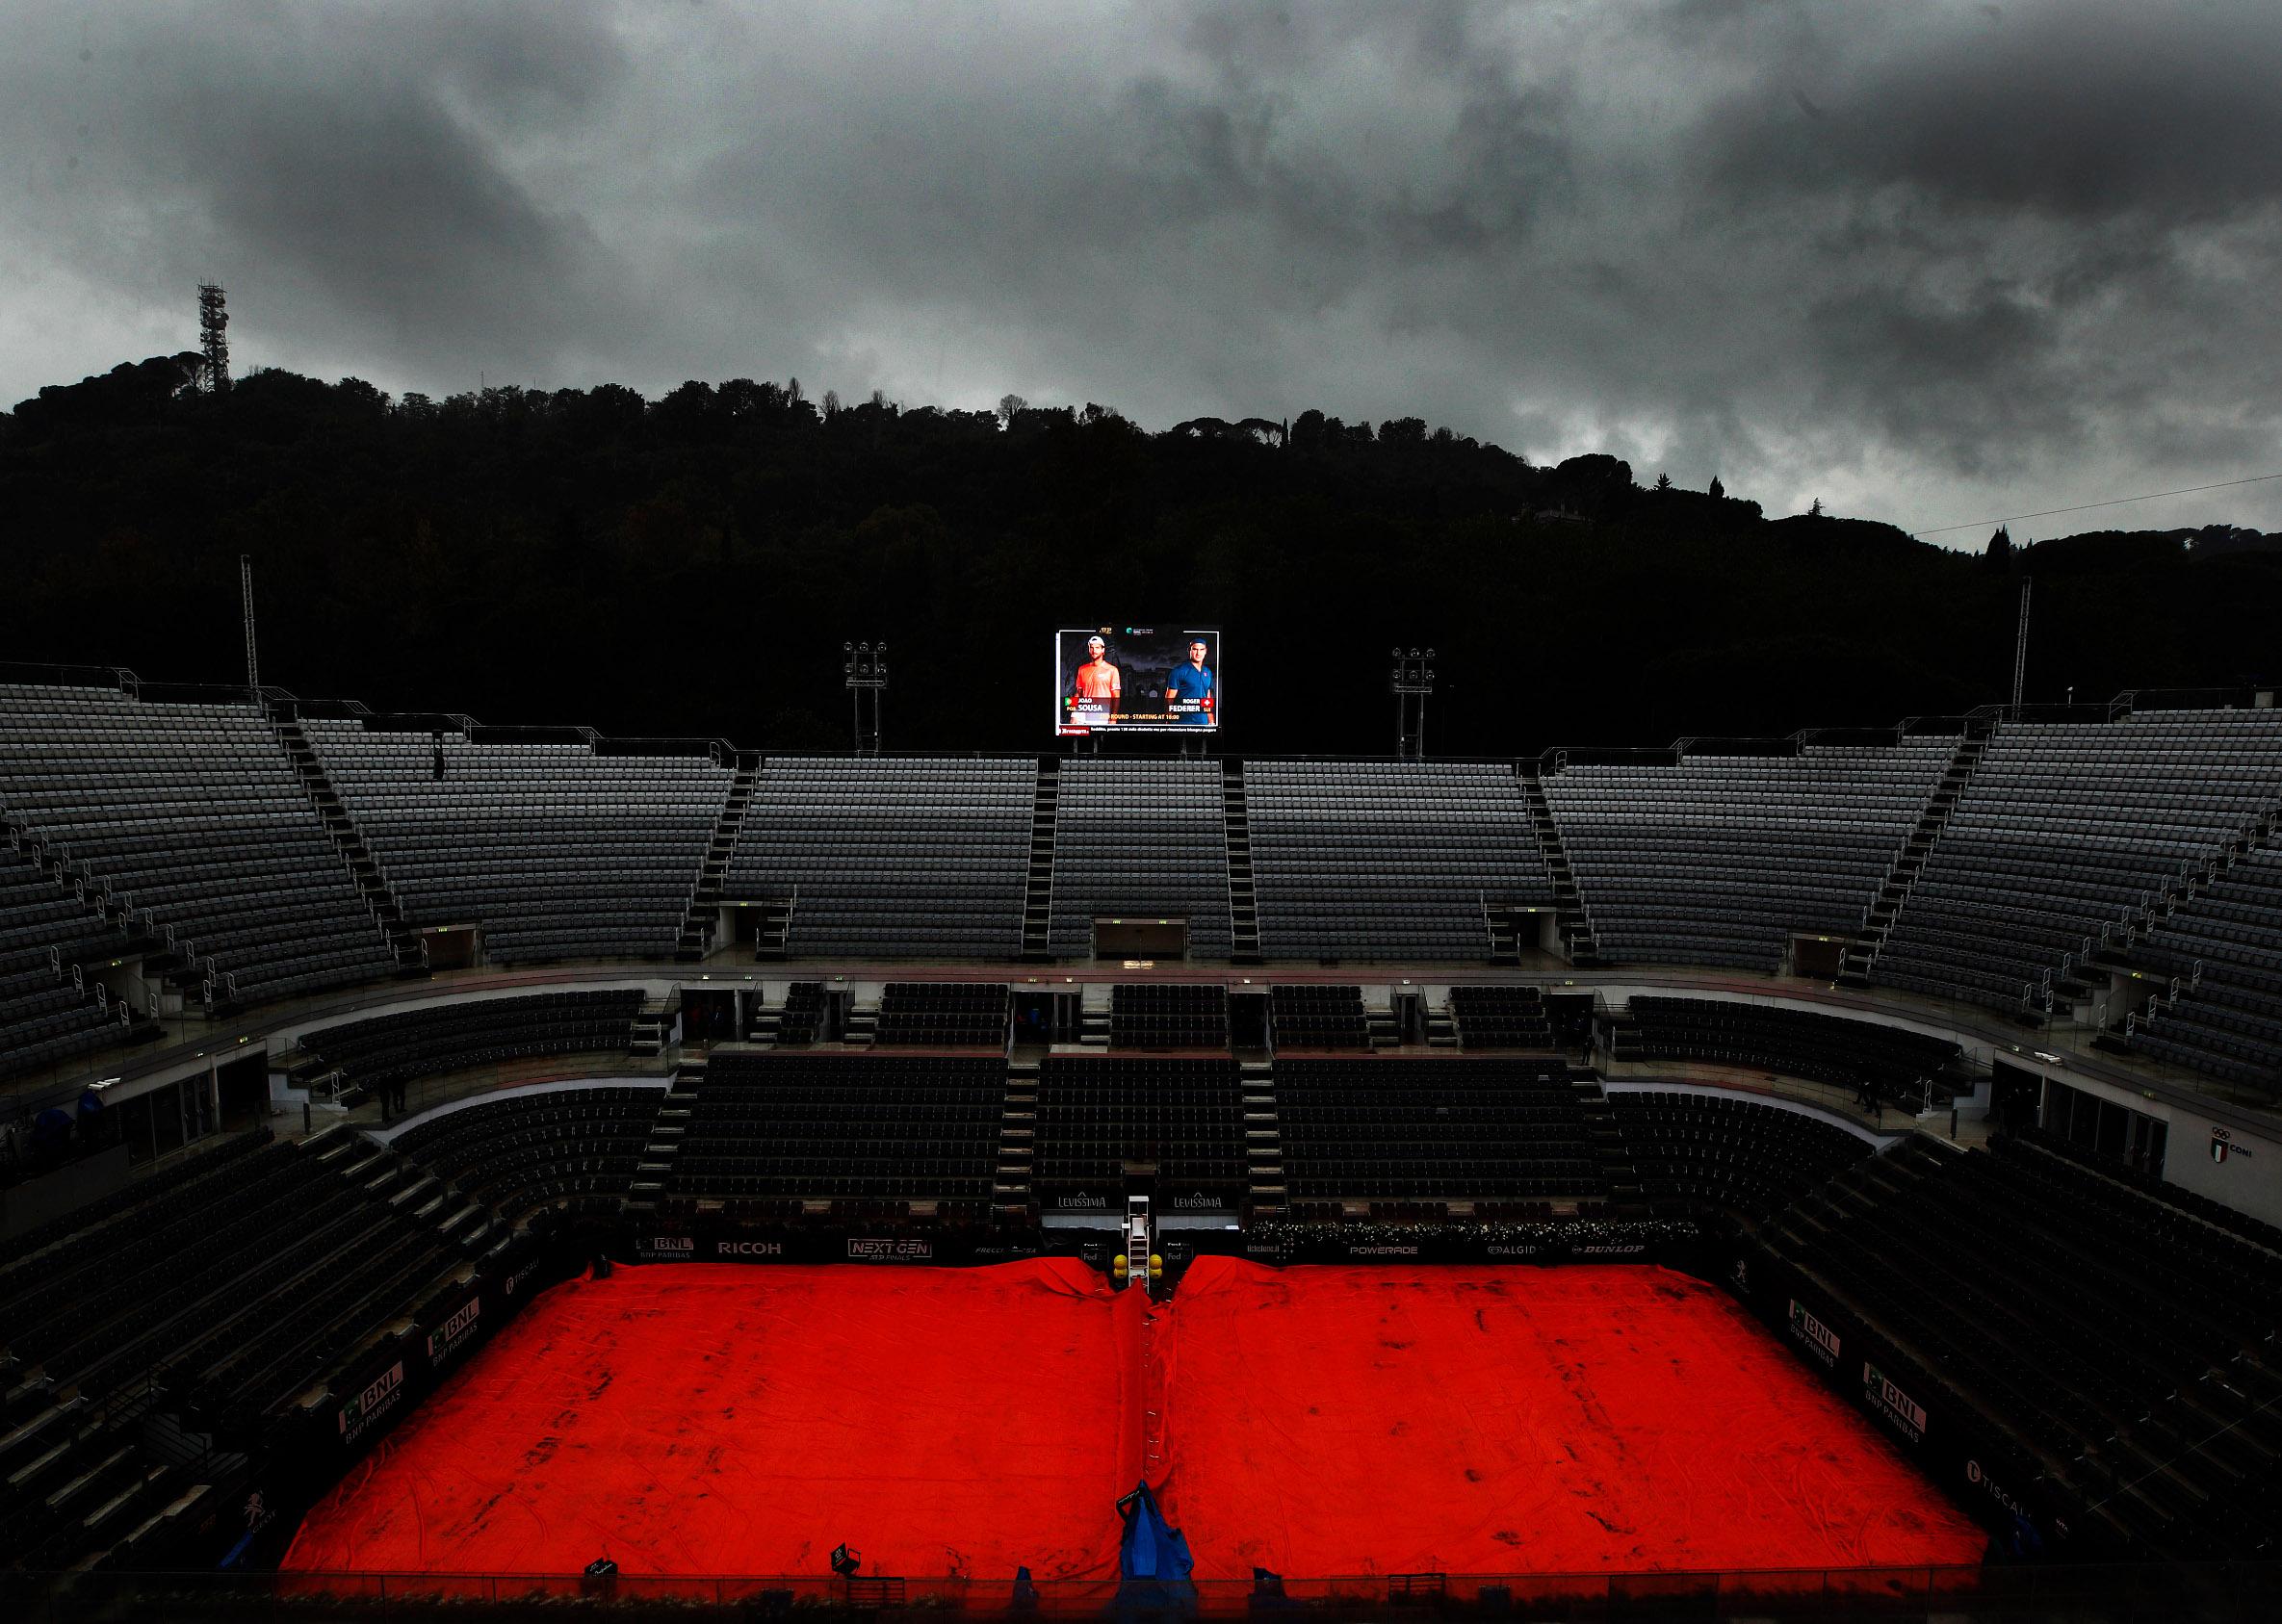 Tenis prazan teren